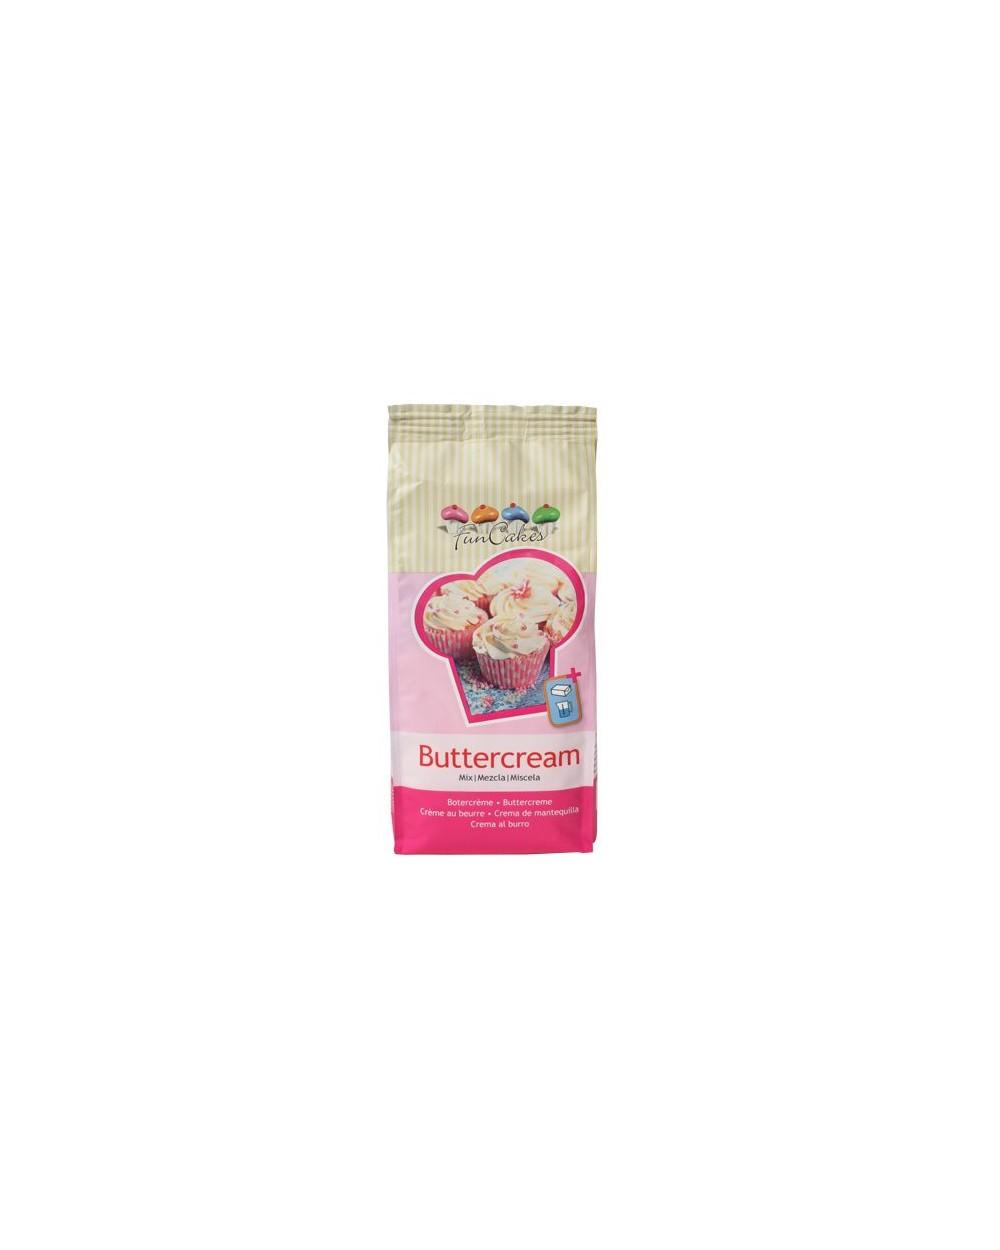 FunCakes Mezcla para Crema de Mantequilla (Buttercream)   500